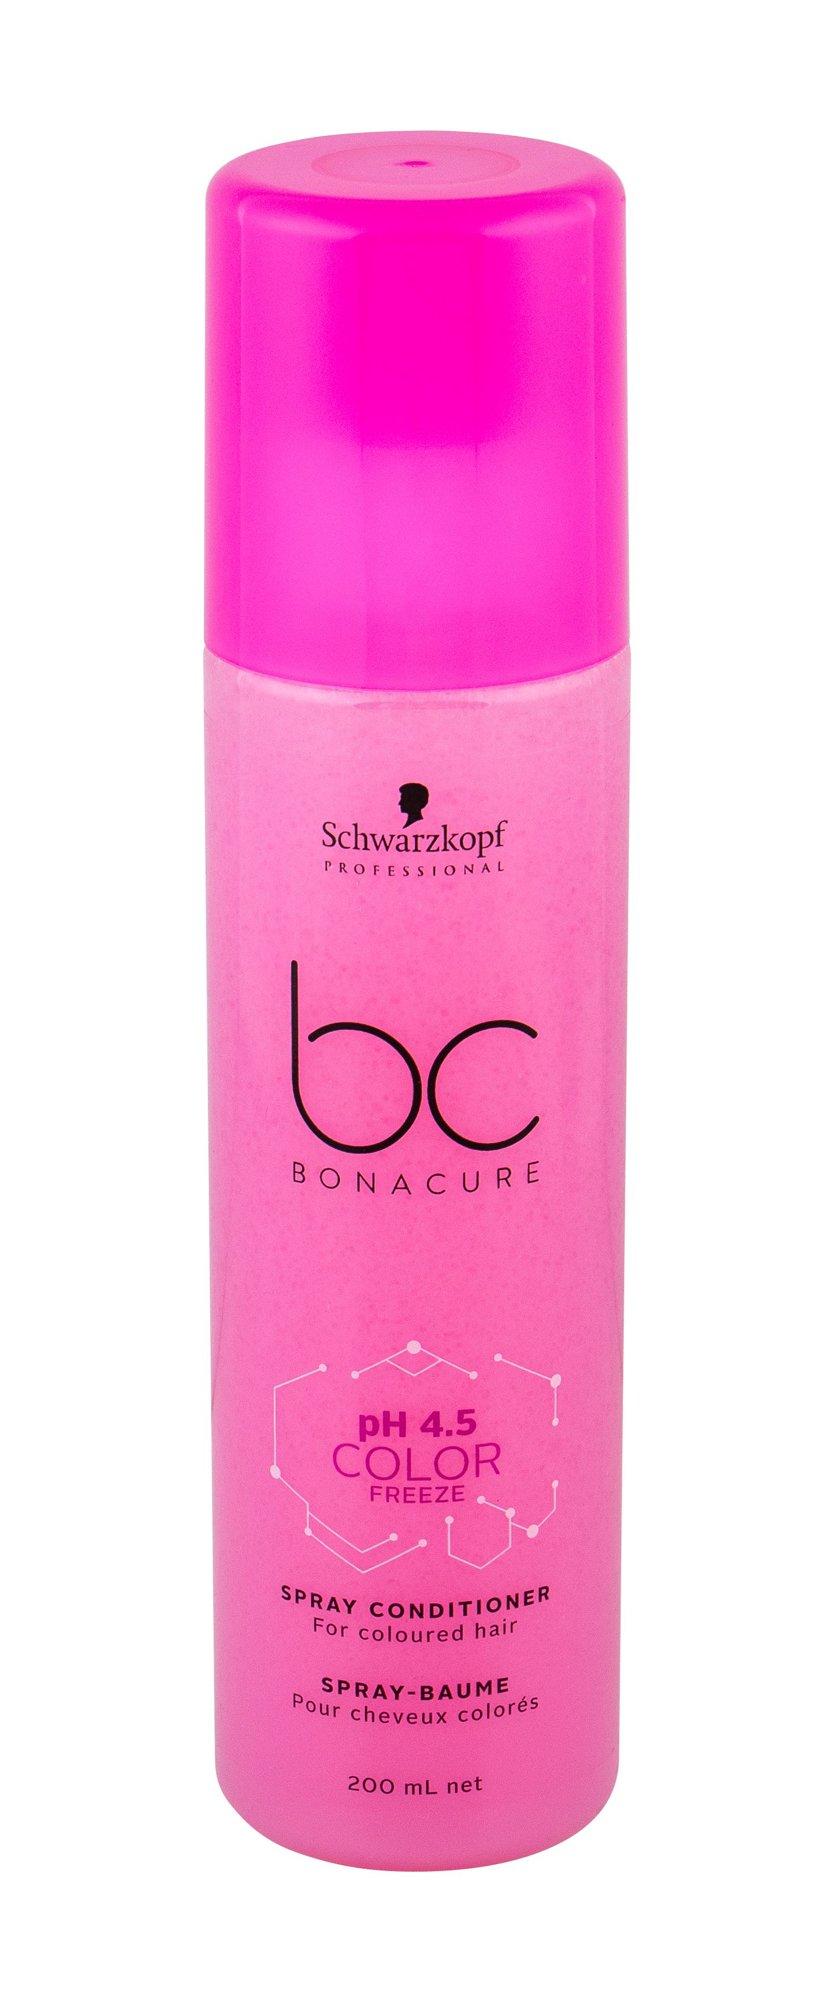 Schwarzkopf BC Bonacure Conditioner 200ml